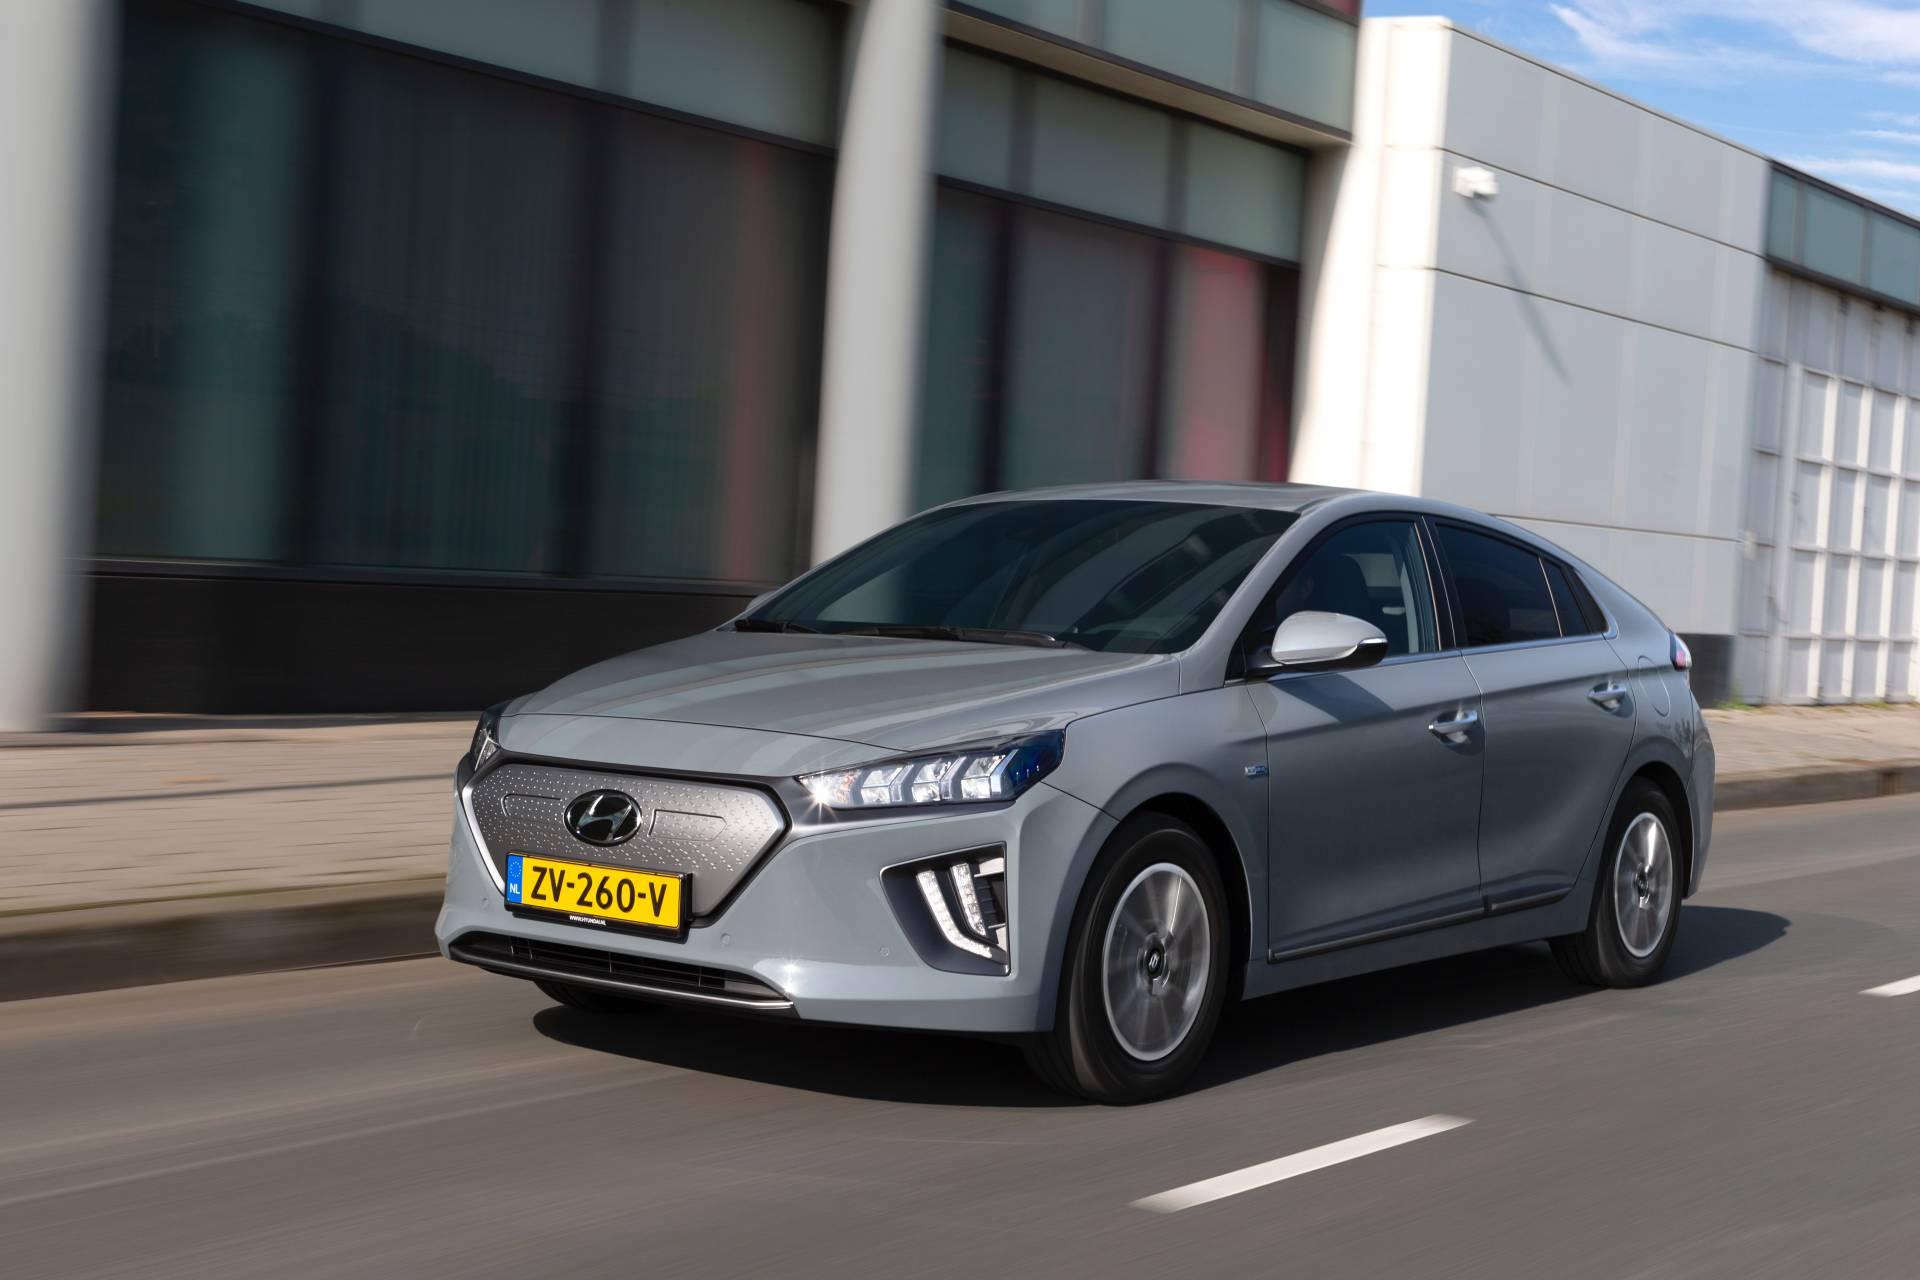 2020 Hyundai Ioniq Electric Namastecar